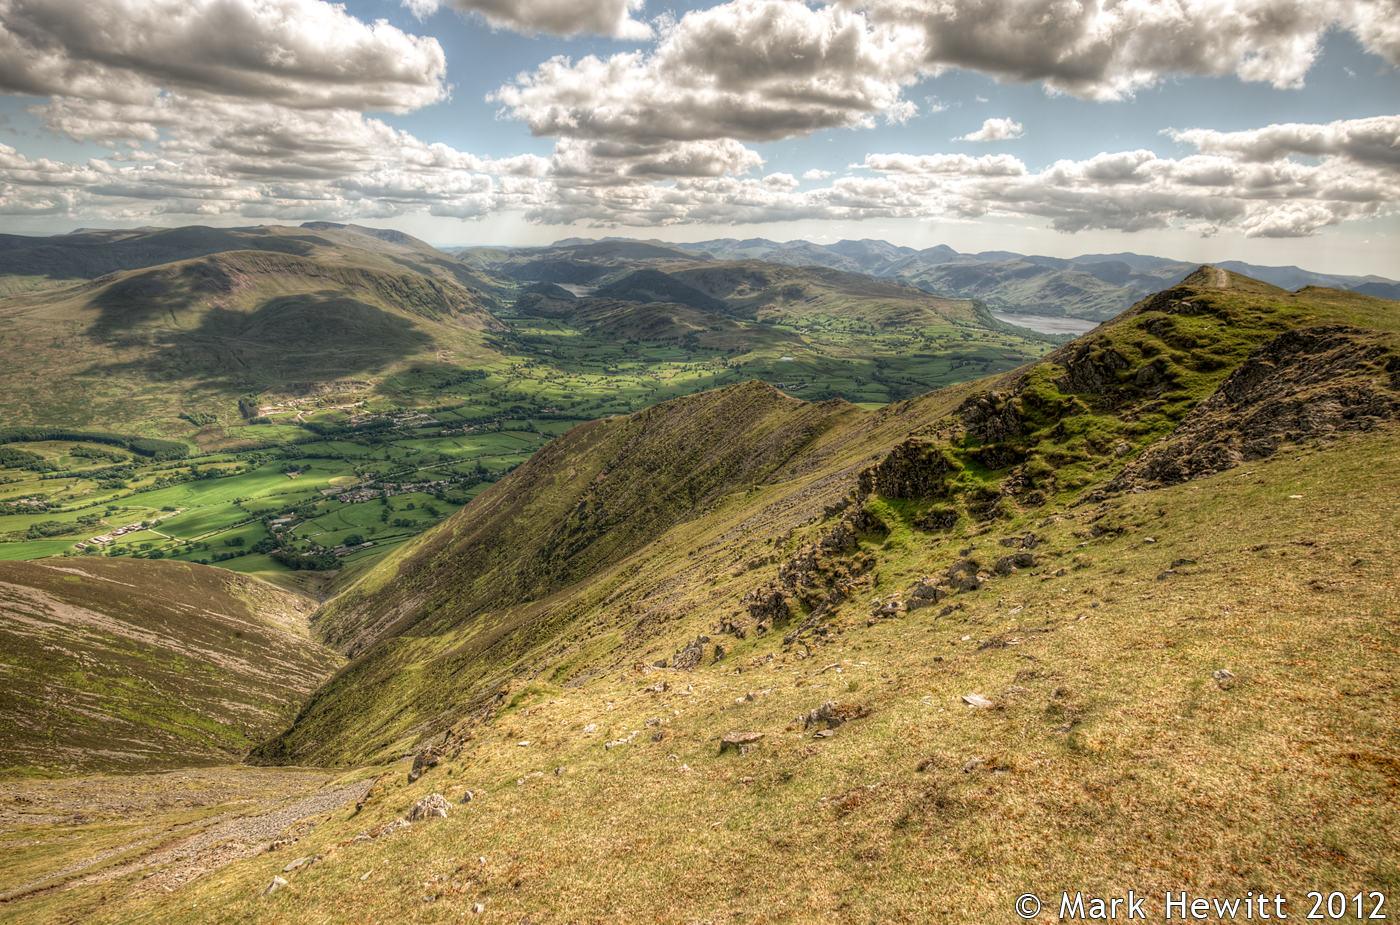 The View Overlooking Gategill Fell (Landscape)